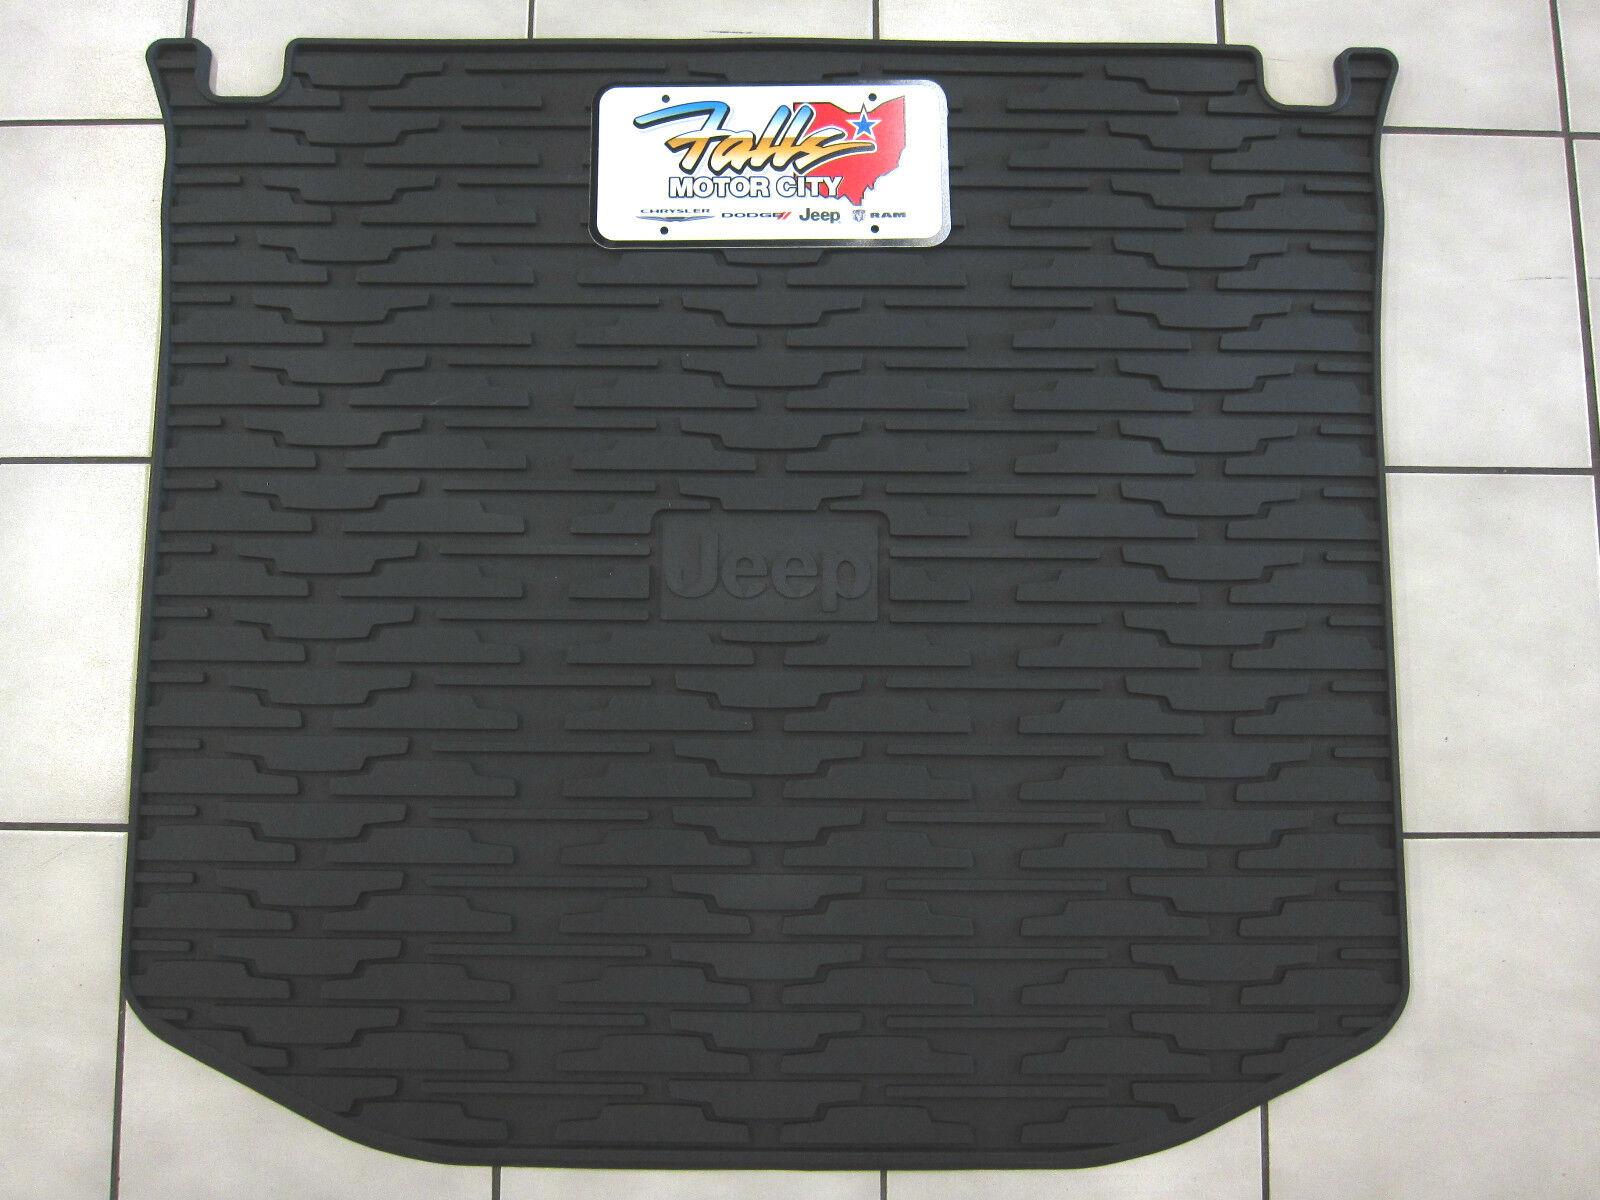 Compatible for 2011-2019 Jeep Grand Cherokee OEM Rubber Rear Cargo Mat 82212085 Mopar